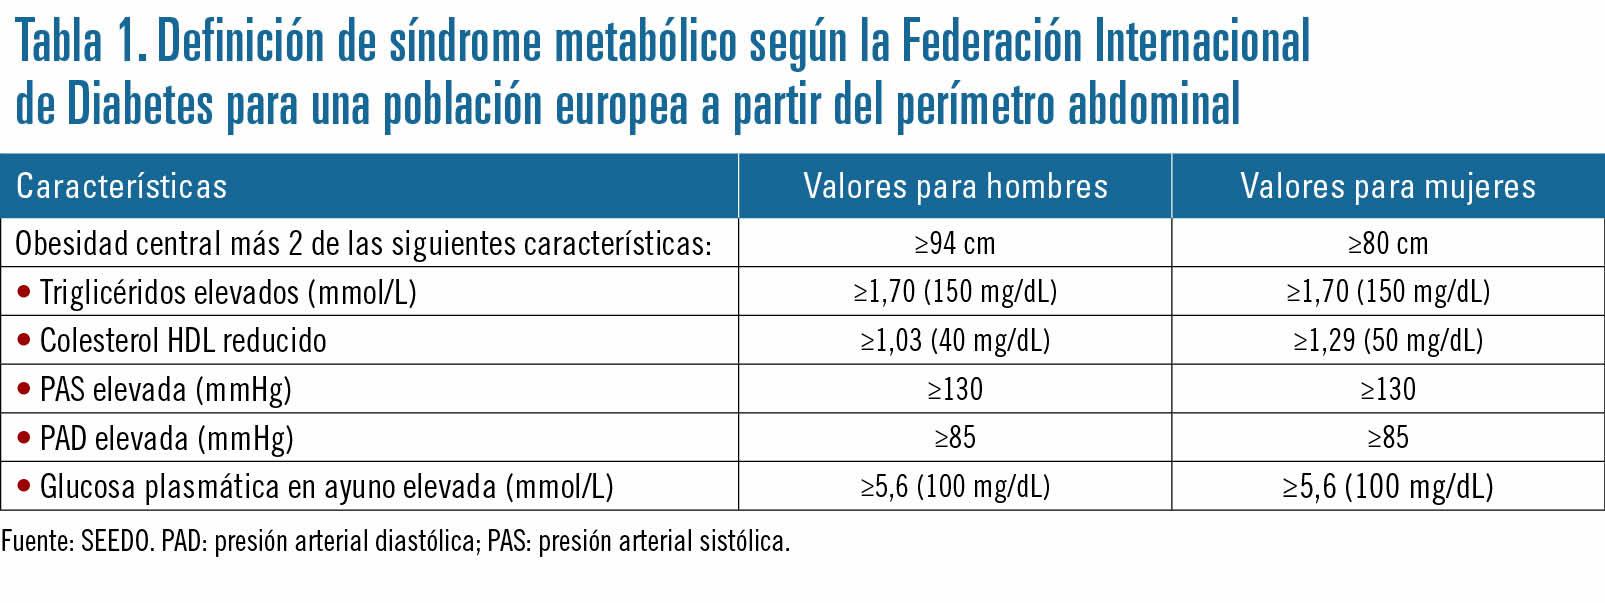 27 EF582 OFICINA FARMACIA ANALISIS tabla 1